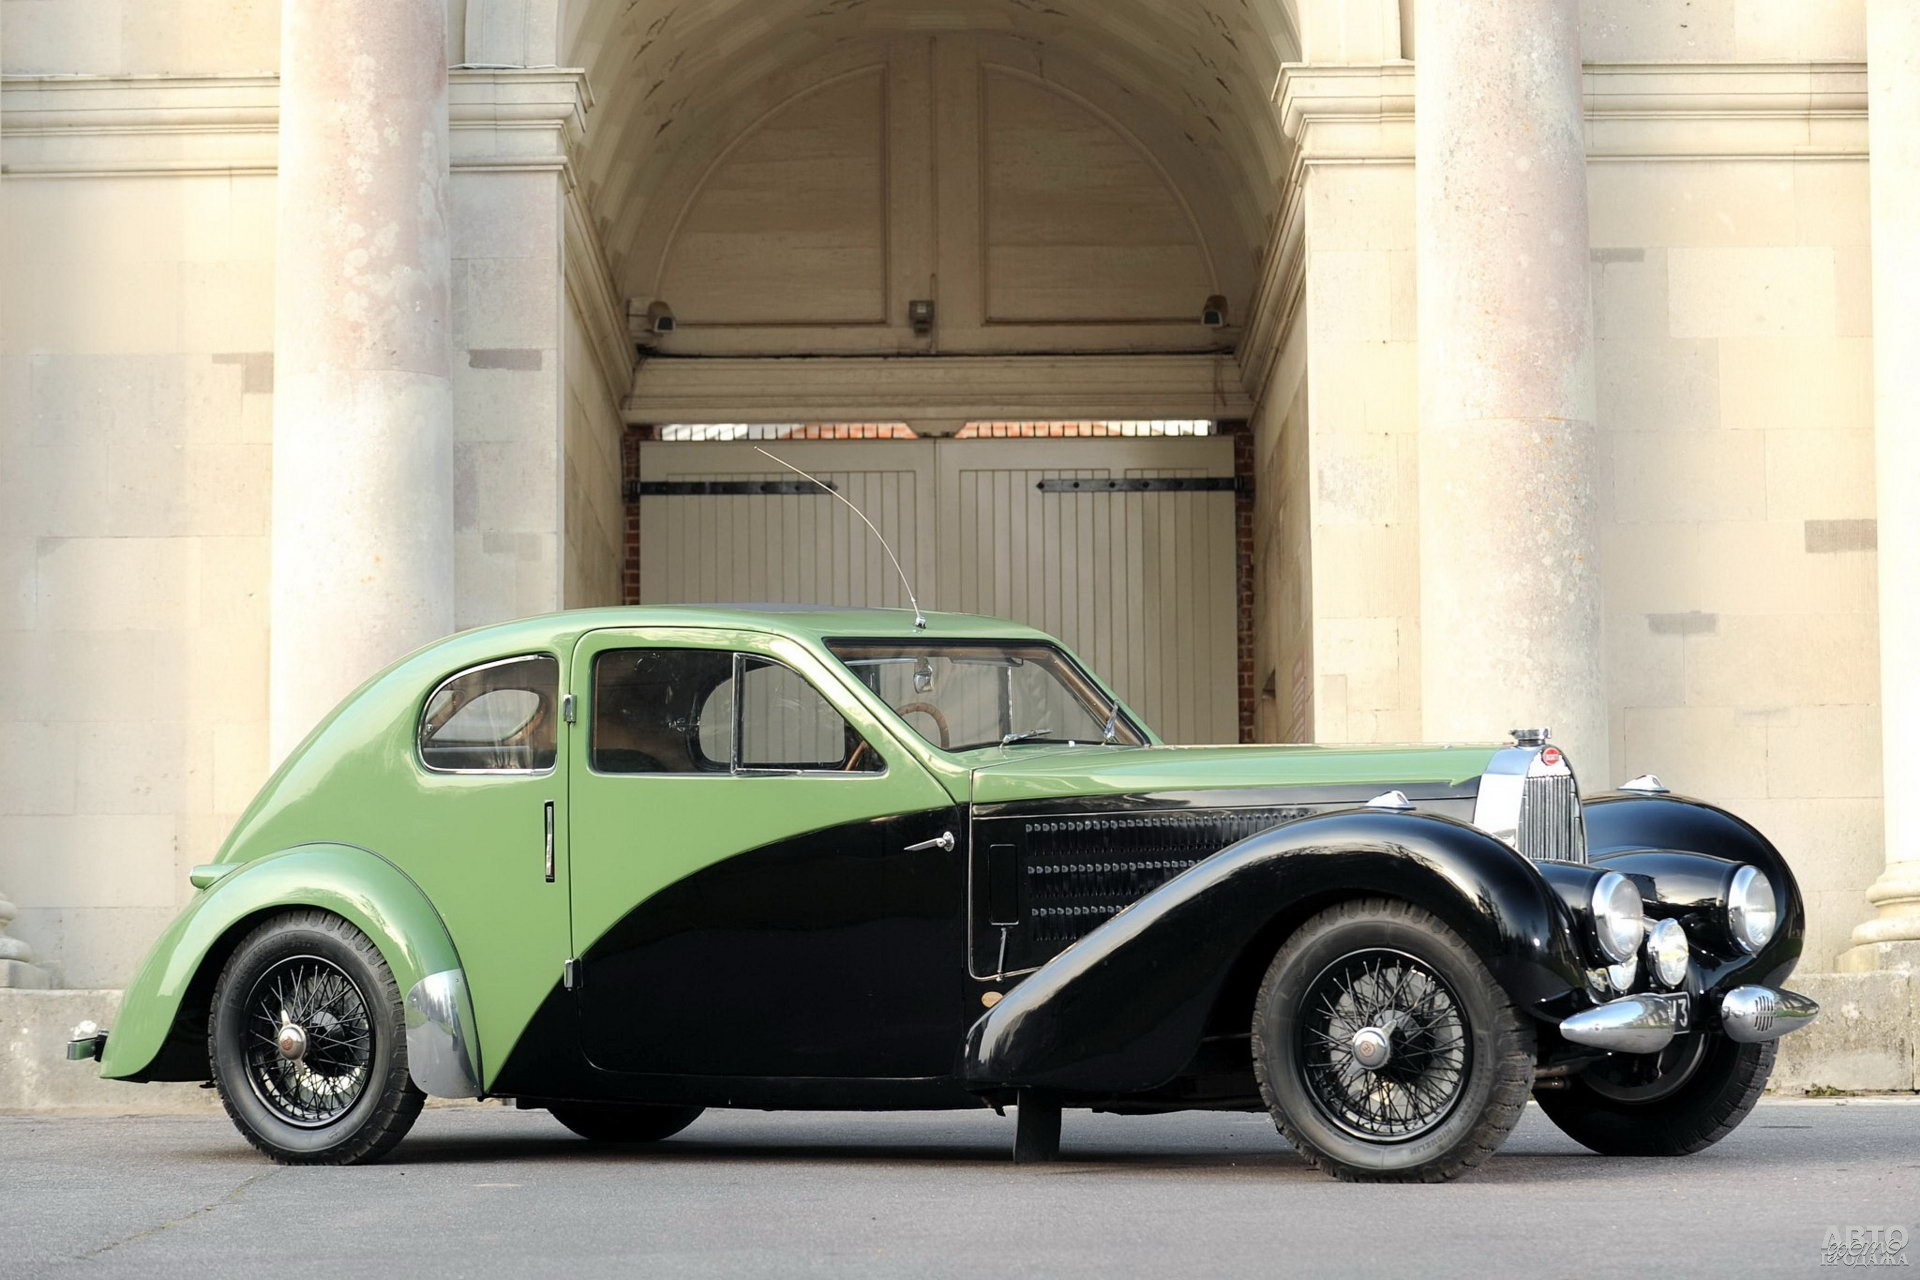 Bugatti Type 57C Coupe Aerodynamique создали для Этторе Бугатти